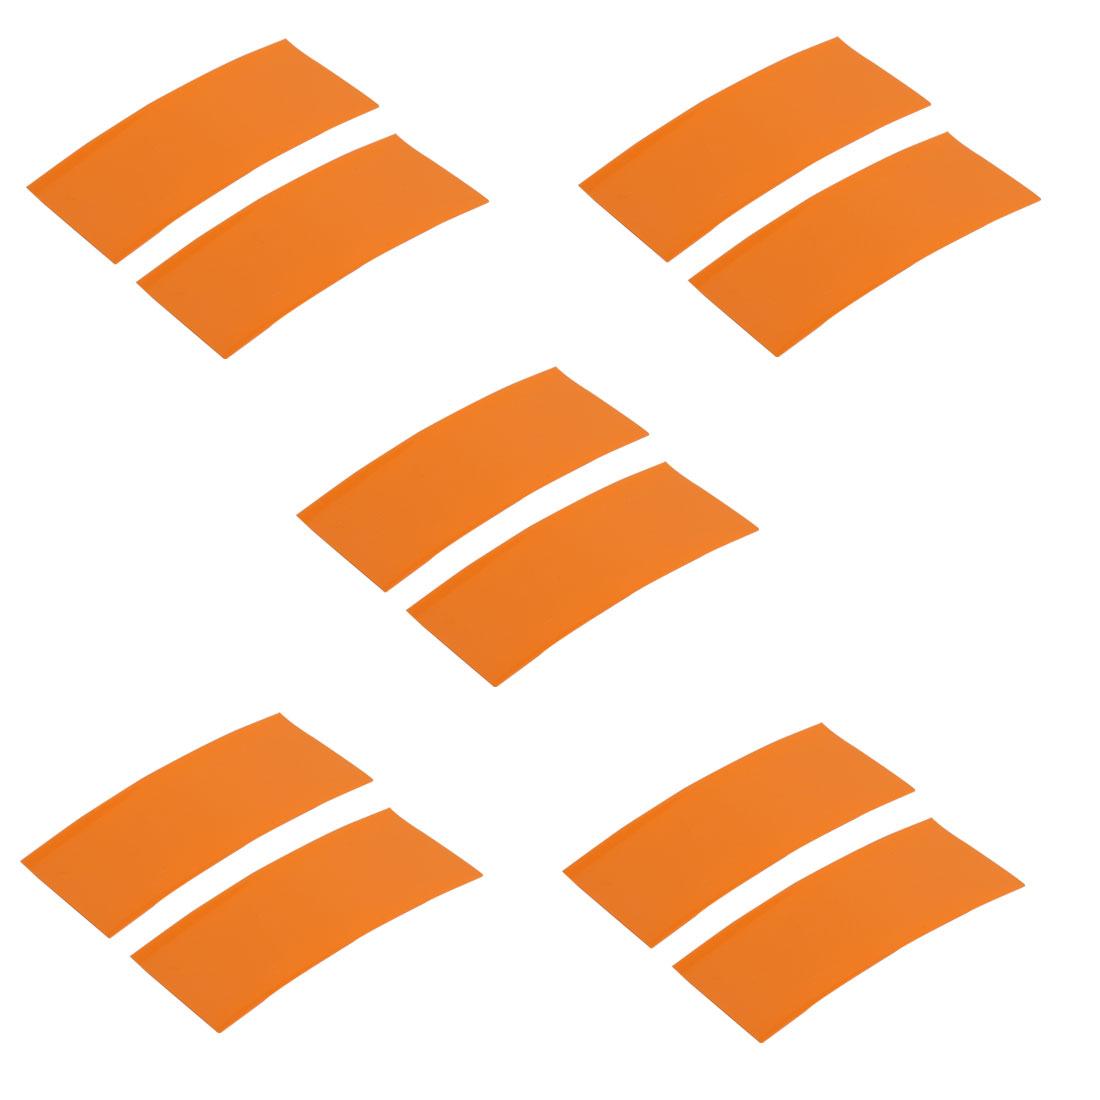 10pcs 23mm Width 53mm Long PVC Heat Shrinkable Tube Orange for AA Battery Pack